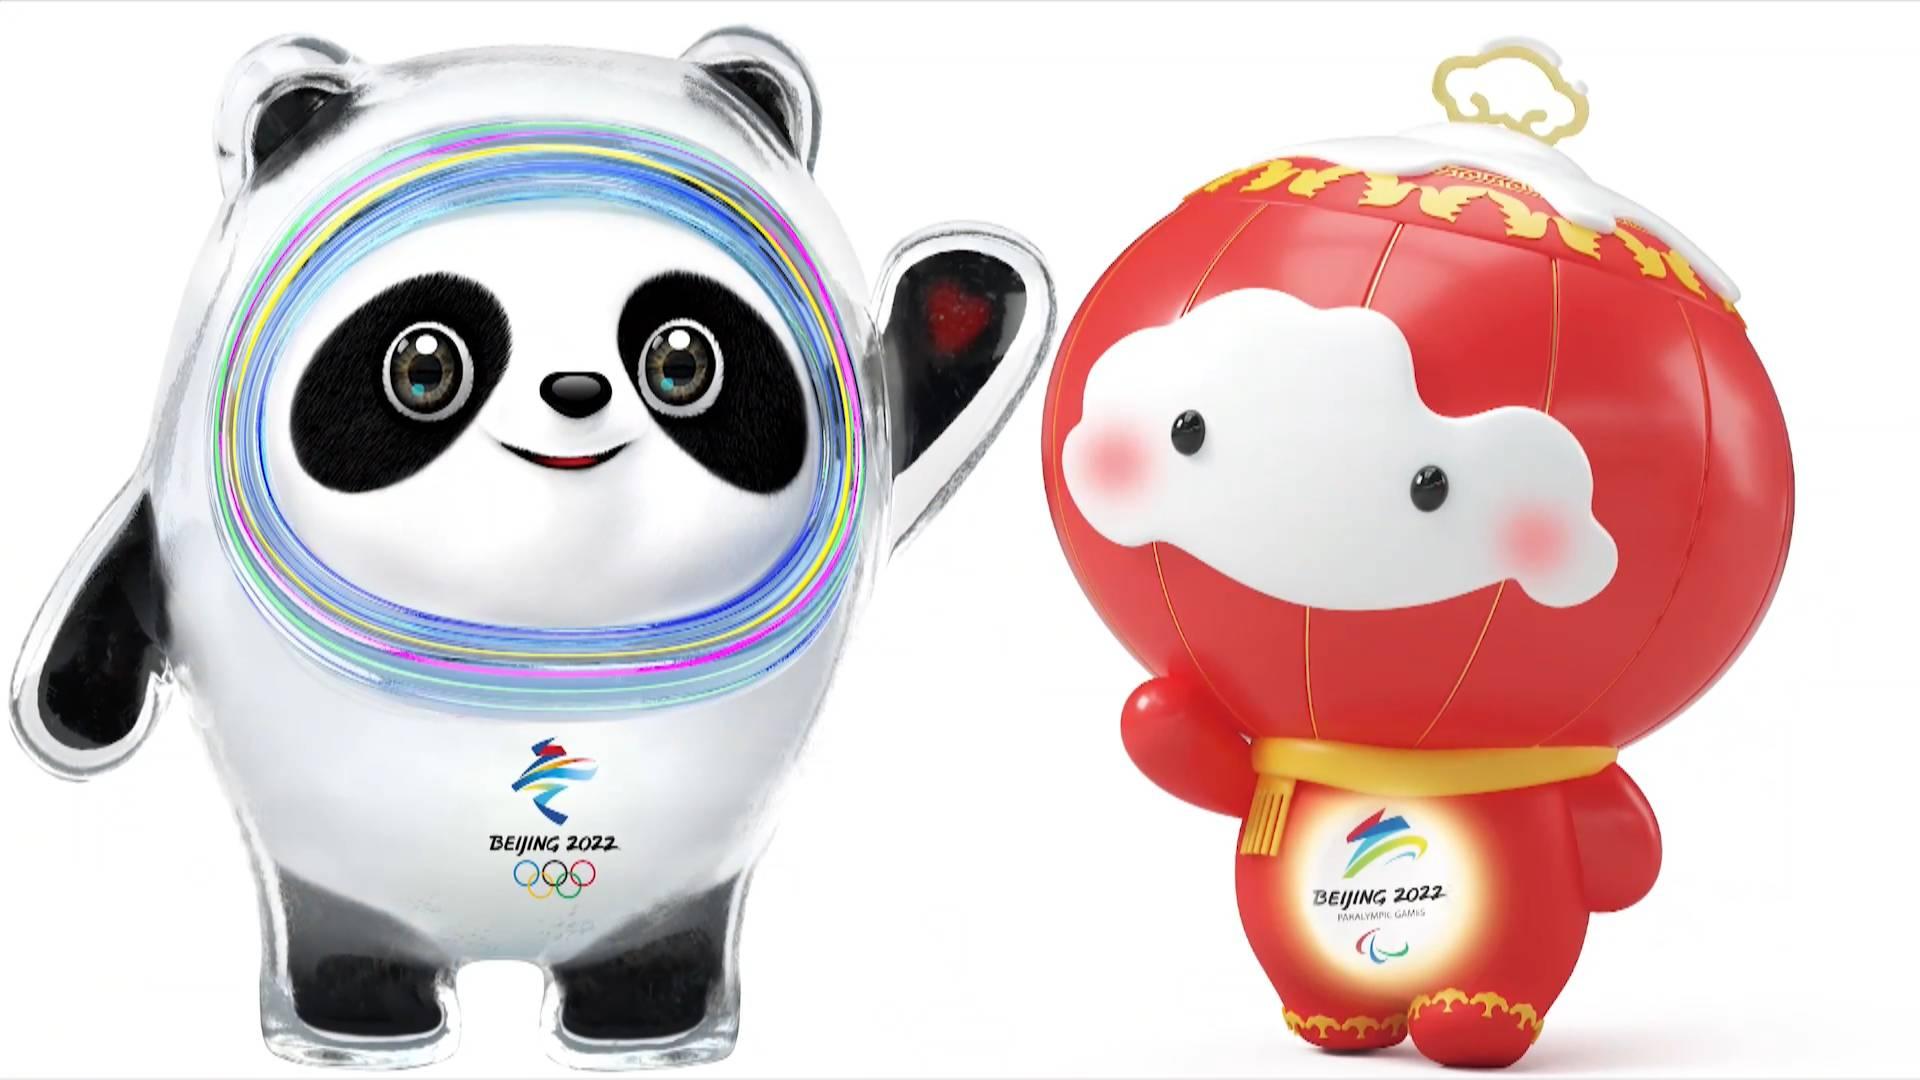 GLOBALink | China ready to host 2022 Winter Olympics: Thai IOC member